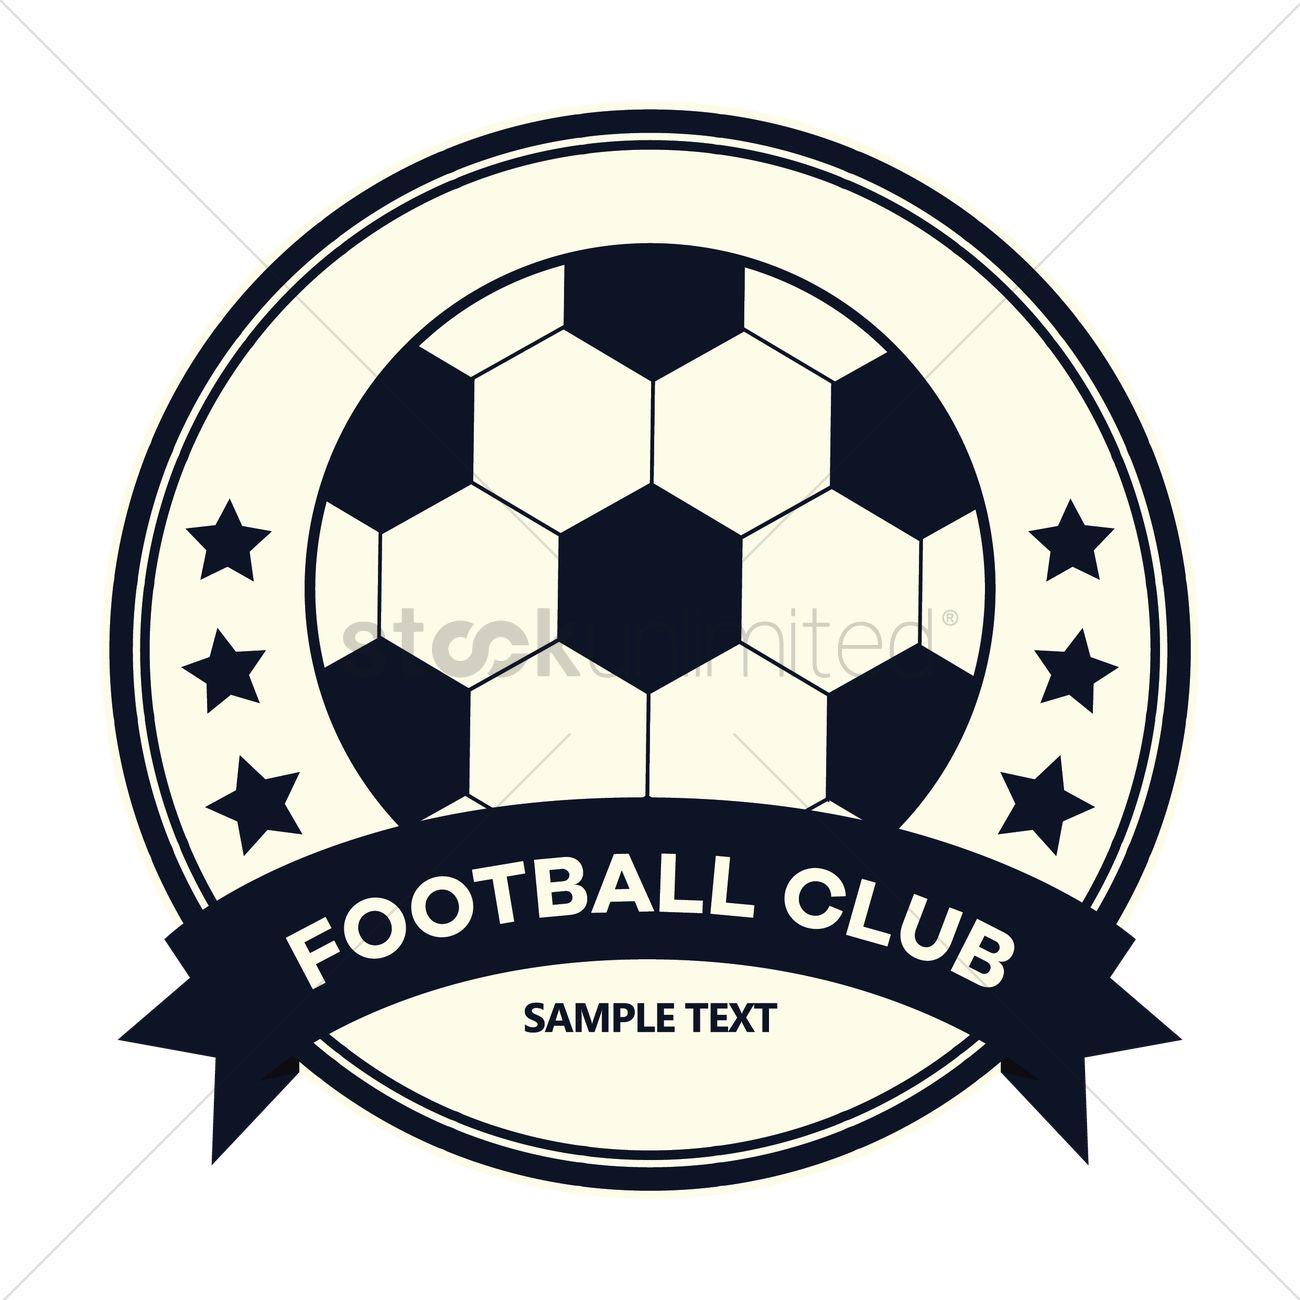 Banner Banners Symbol Symbols Football Footballs Sport Club Clubs